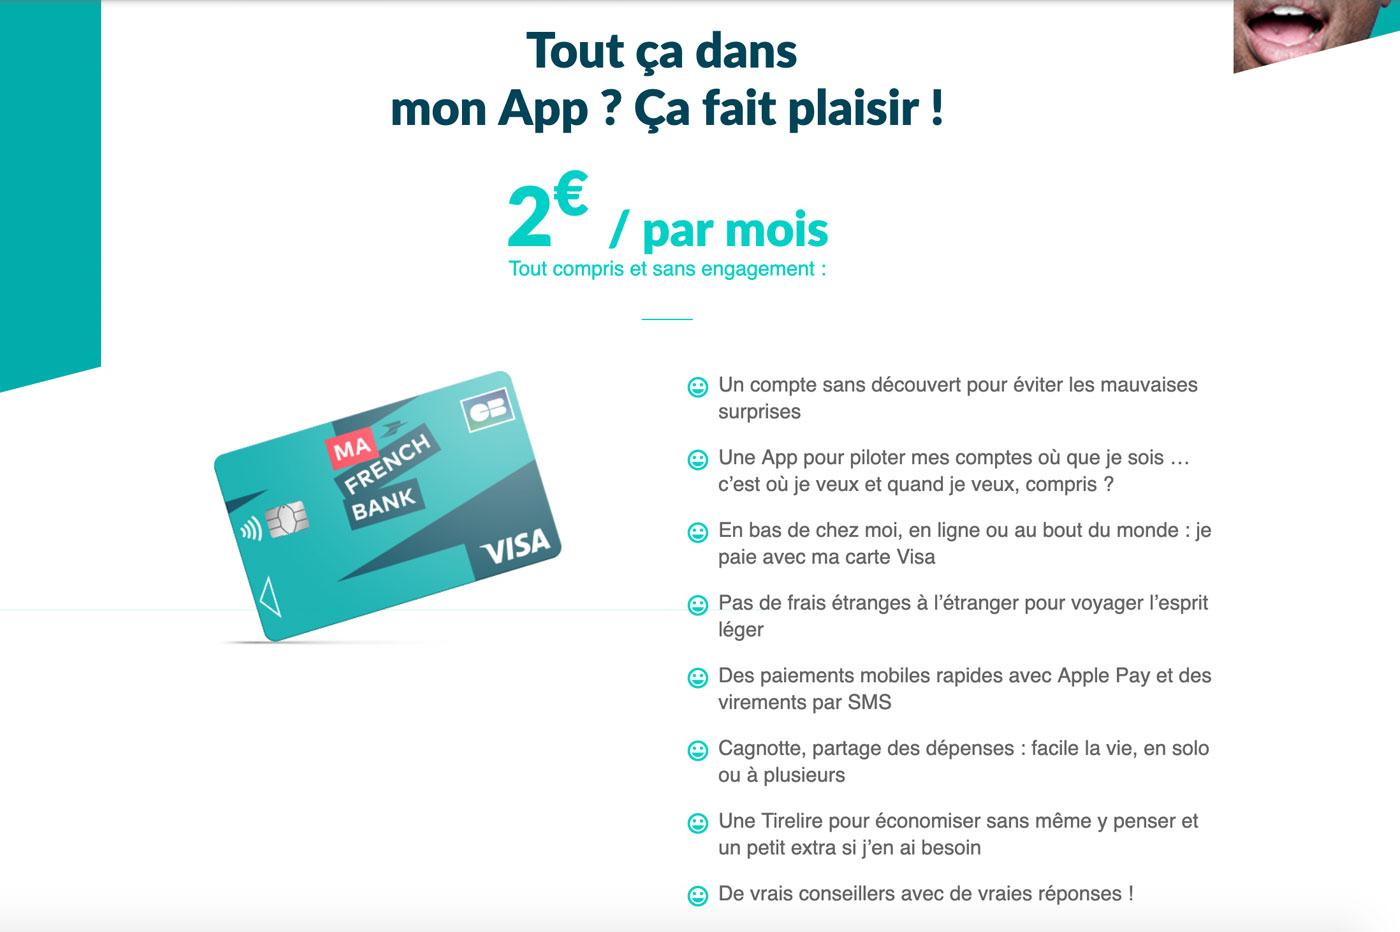 La promesse Ma French Bank